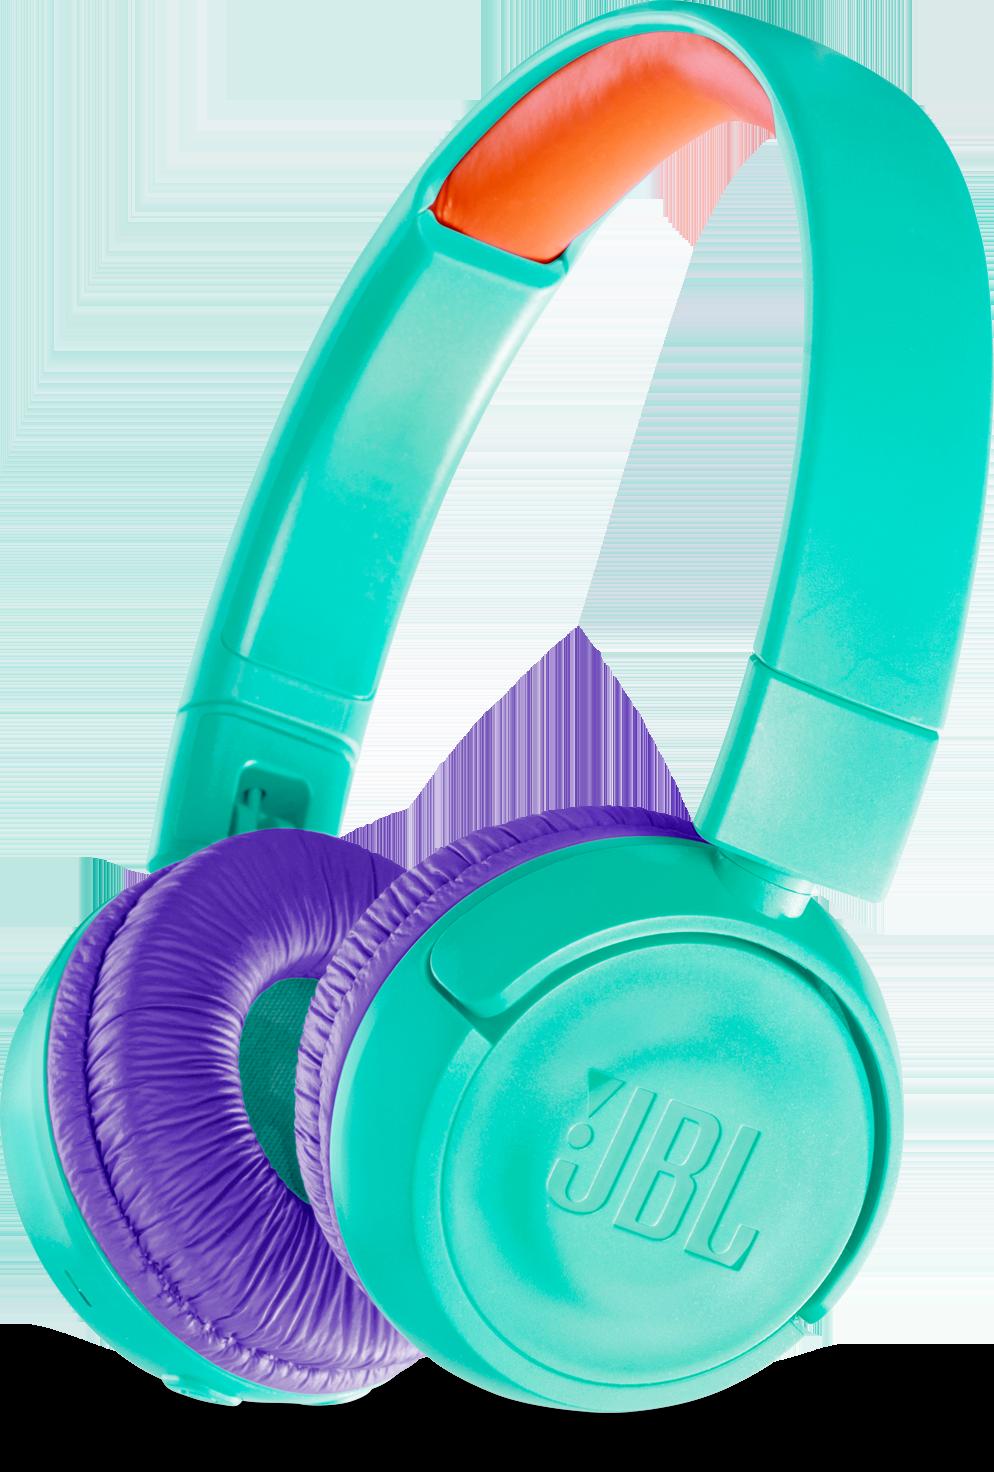 RE3HLF7?ver=e802 - JBL JR300 BT Headphones